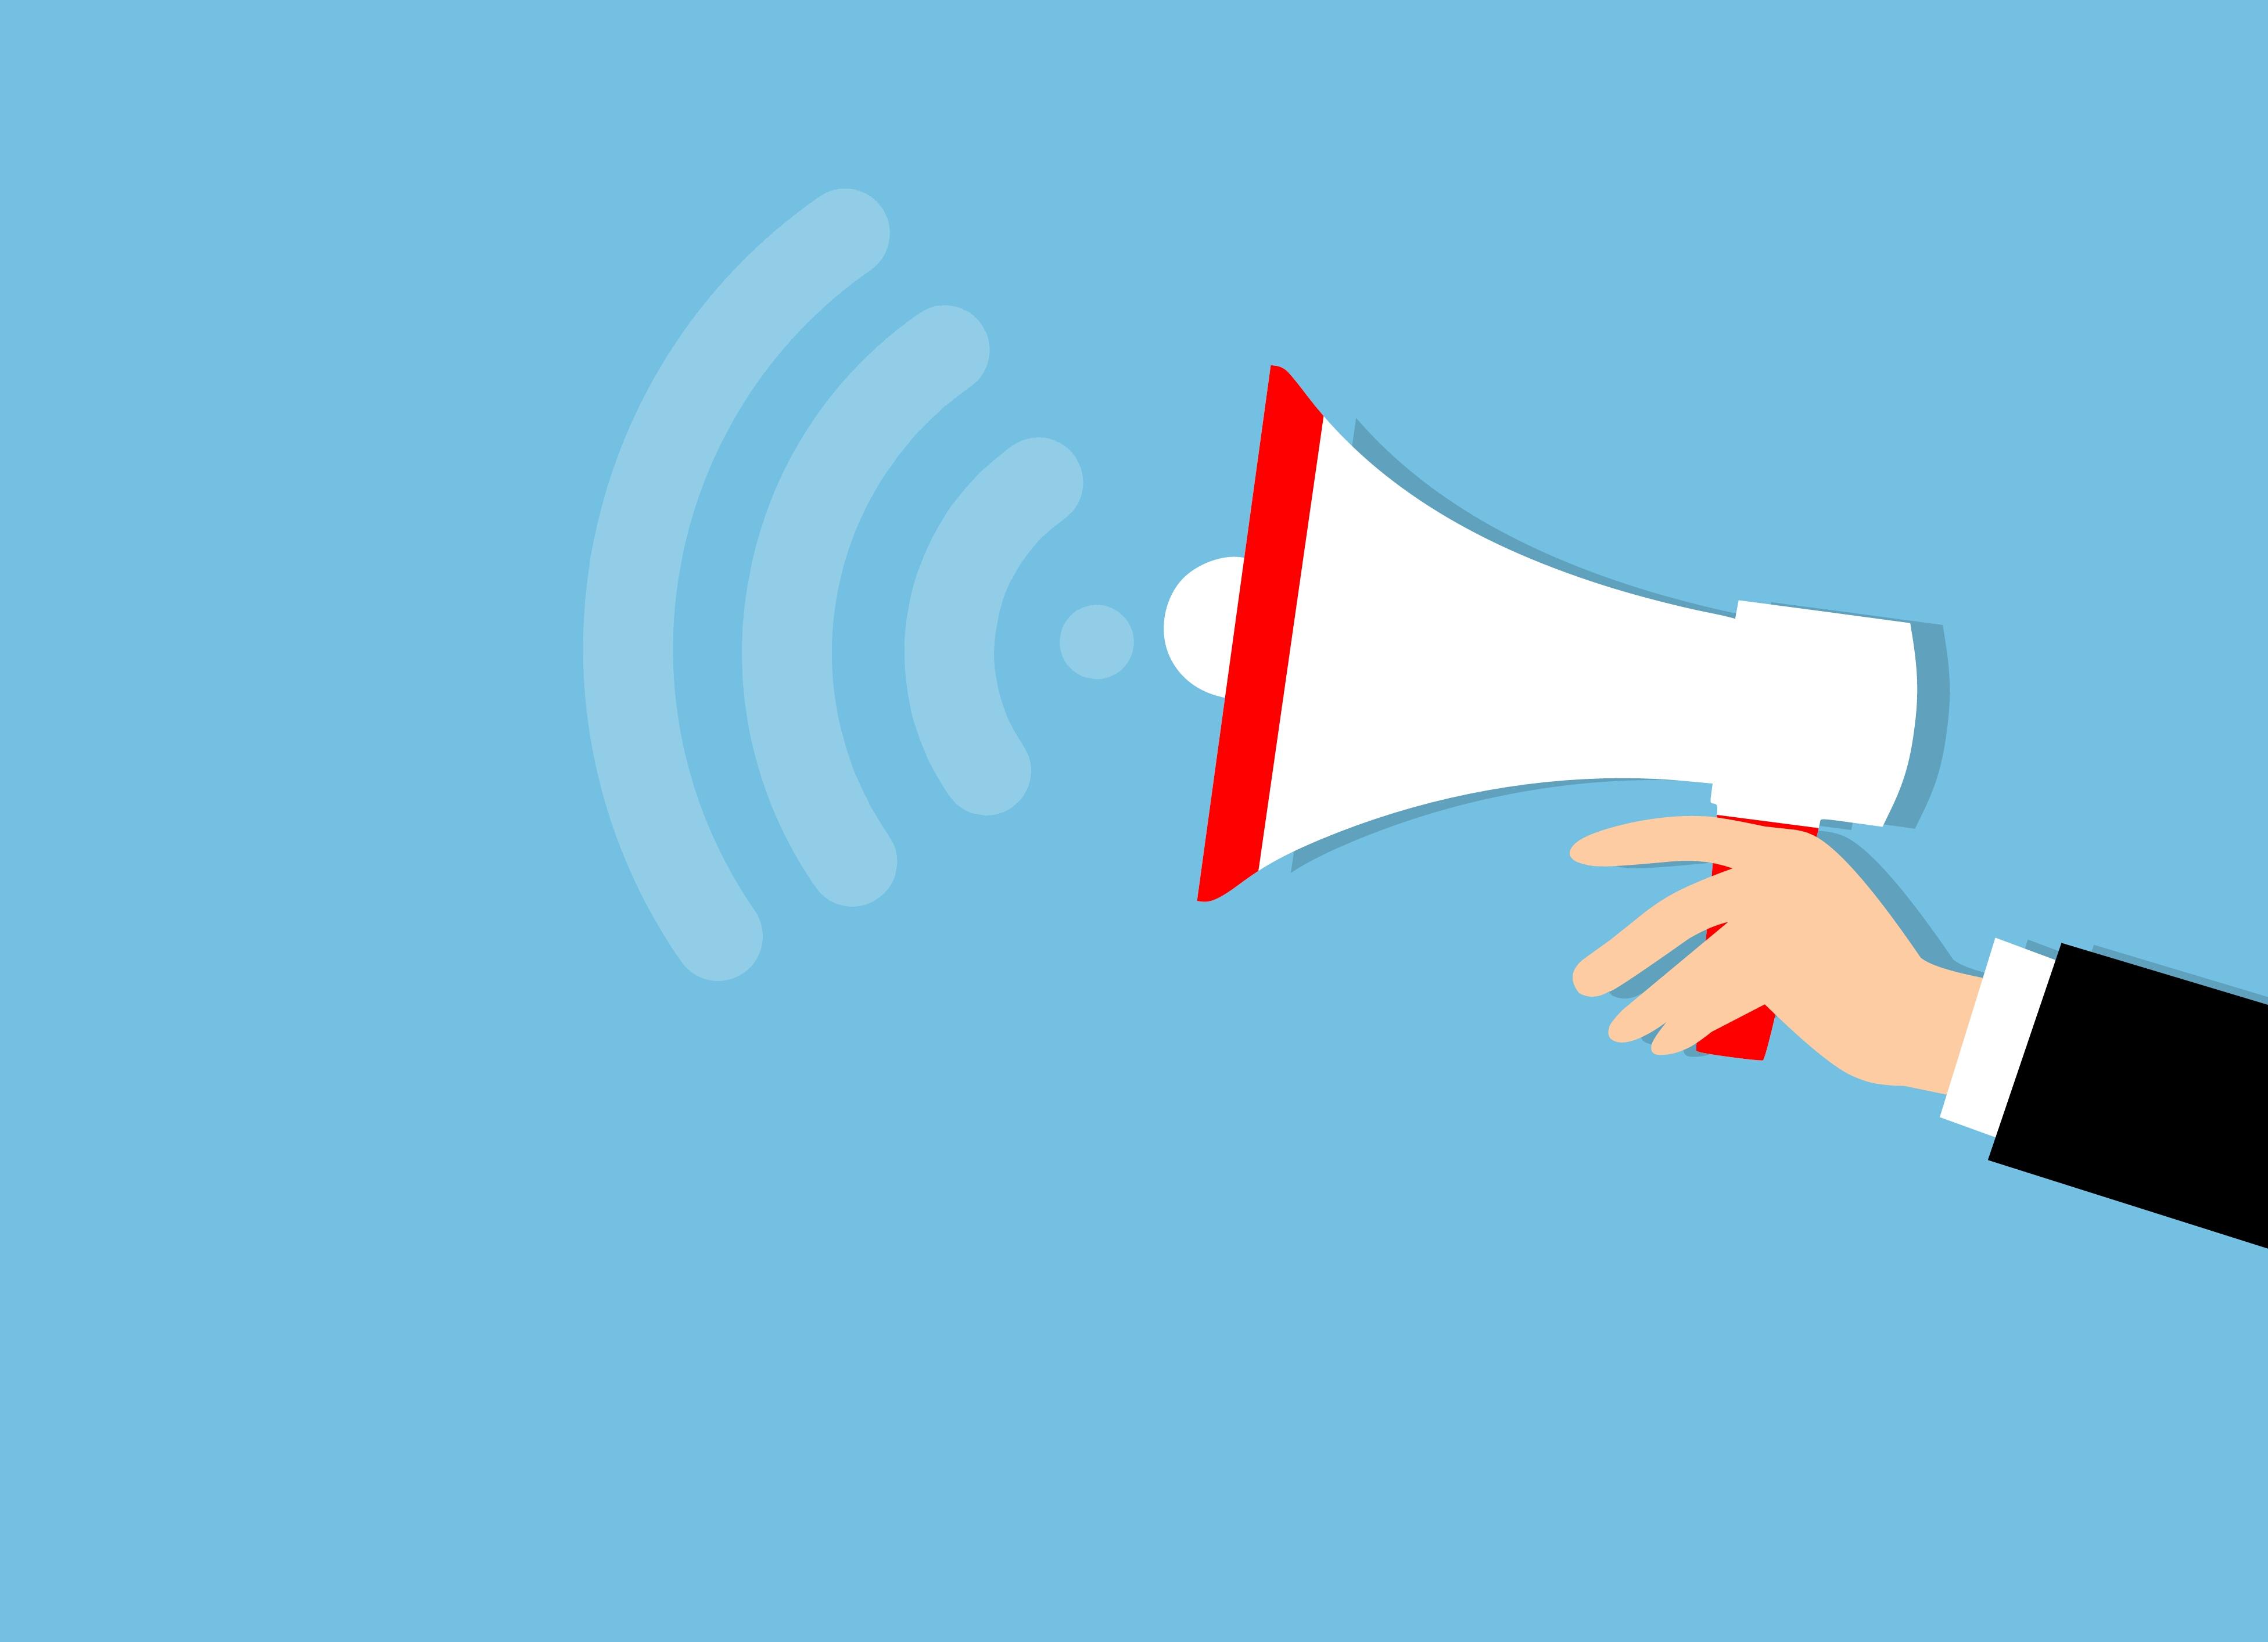 Gambar Pemasaran Megafon Iklan Pengumuman Penyiaran Tanduk Waspada Peralatan Spanduk Komunikasi Audio Bisnis Keras Pembicara Promosi Informasi Memajukan Pesan Presentasi Suara Pidato Langit Garis Fon Jabatan Tangan Sudut